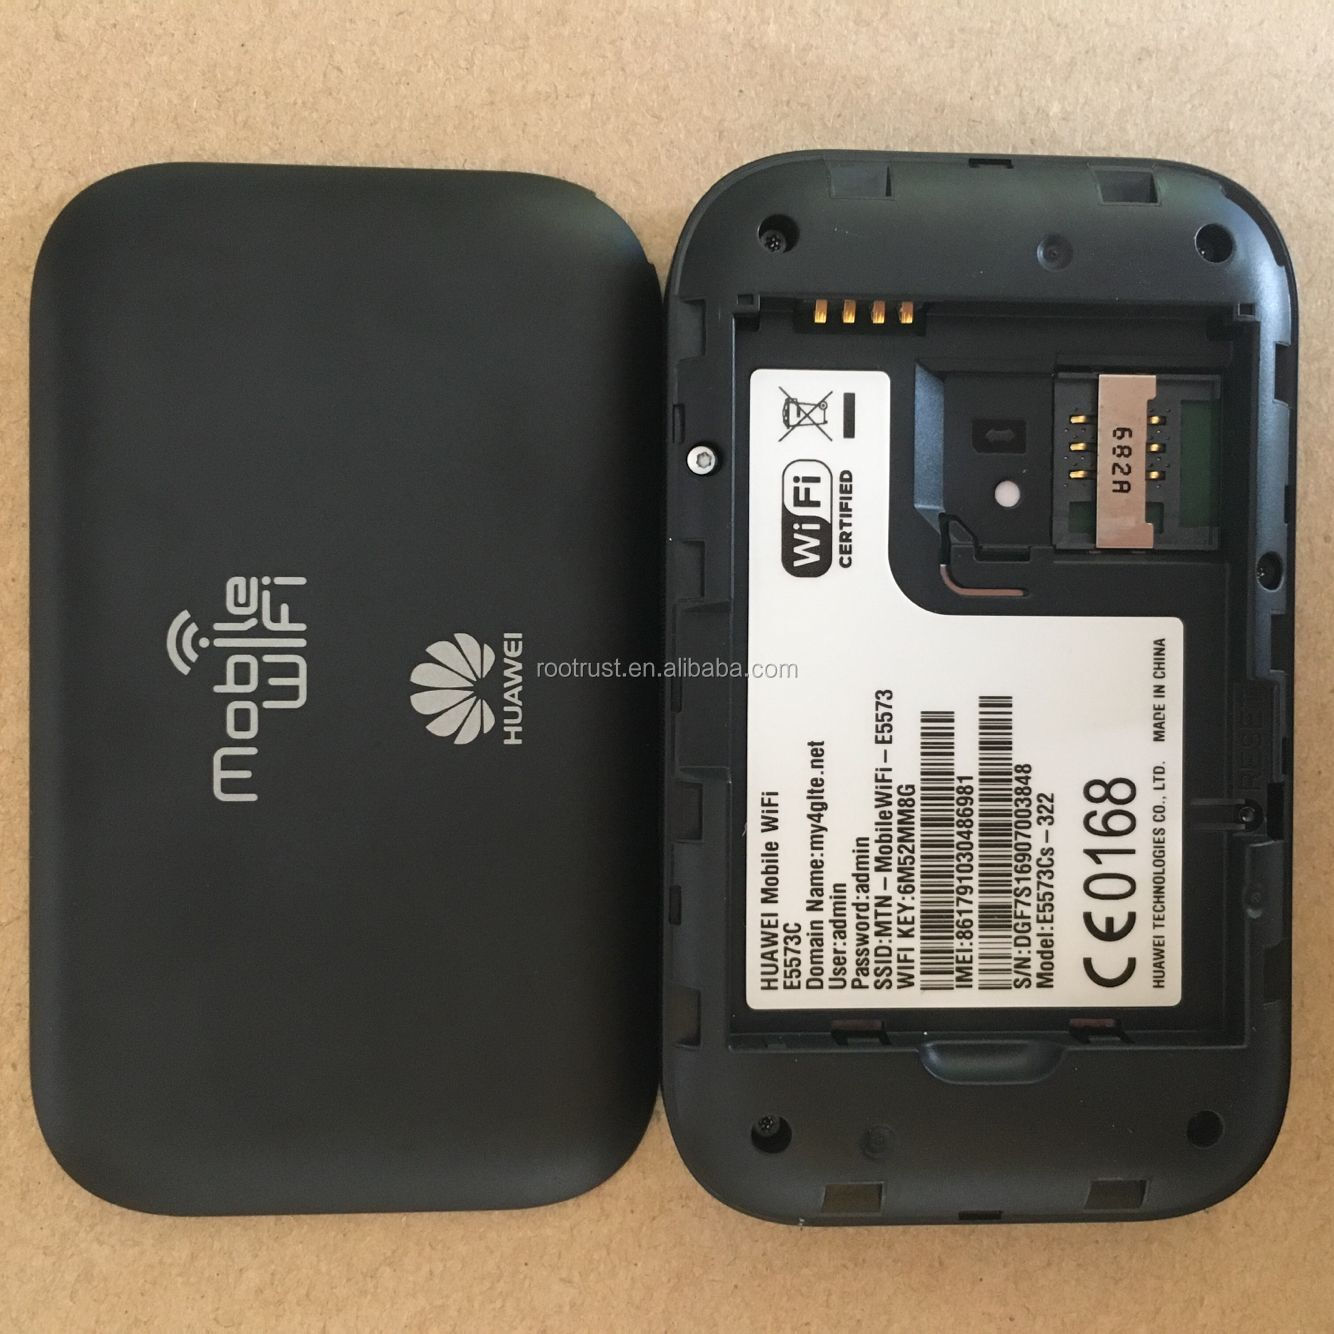 Brand New Huawei E5573s-320 E5573cs-322 4g Mobile Hotspot Lte Cat4 Wifi  Router - Buy Best 4g Wifi Router,Best 4g Lte Wifi Router,Windows Mobile 6 5